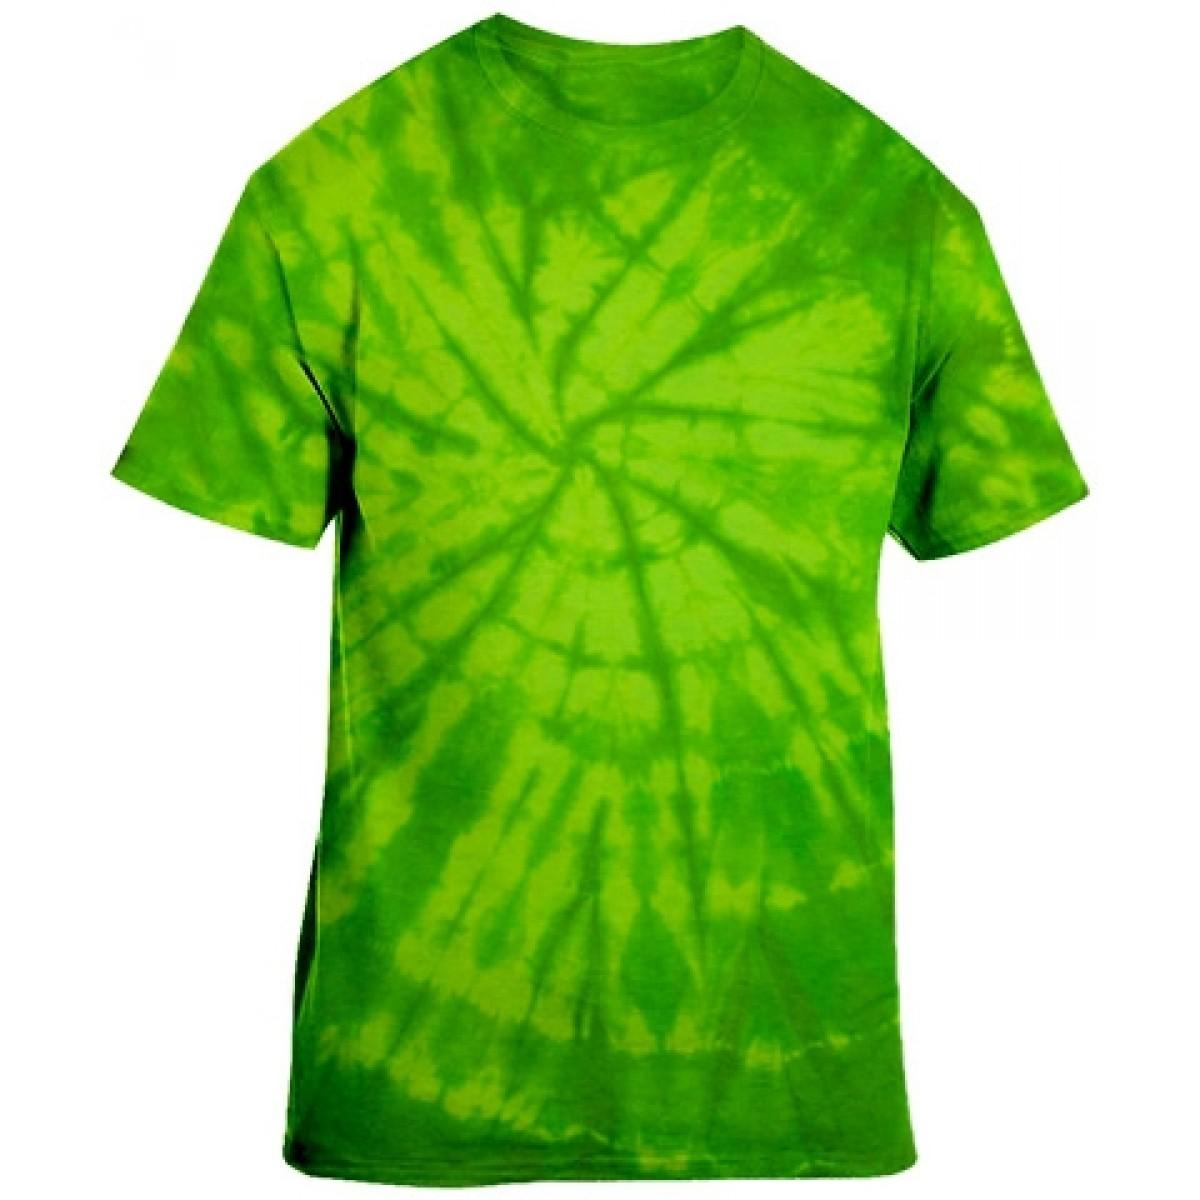 Tie-Dye Neon Green Short Sleeve-Neon Green-YL